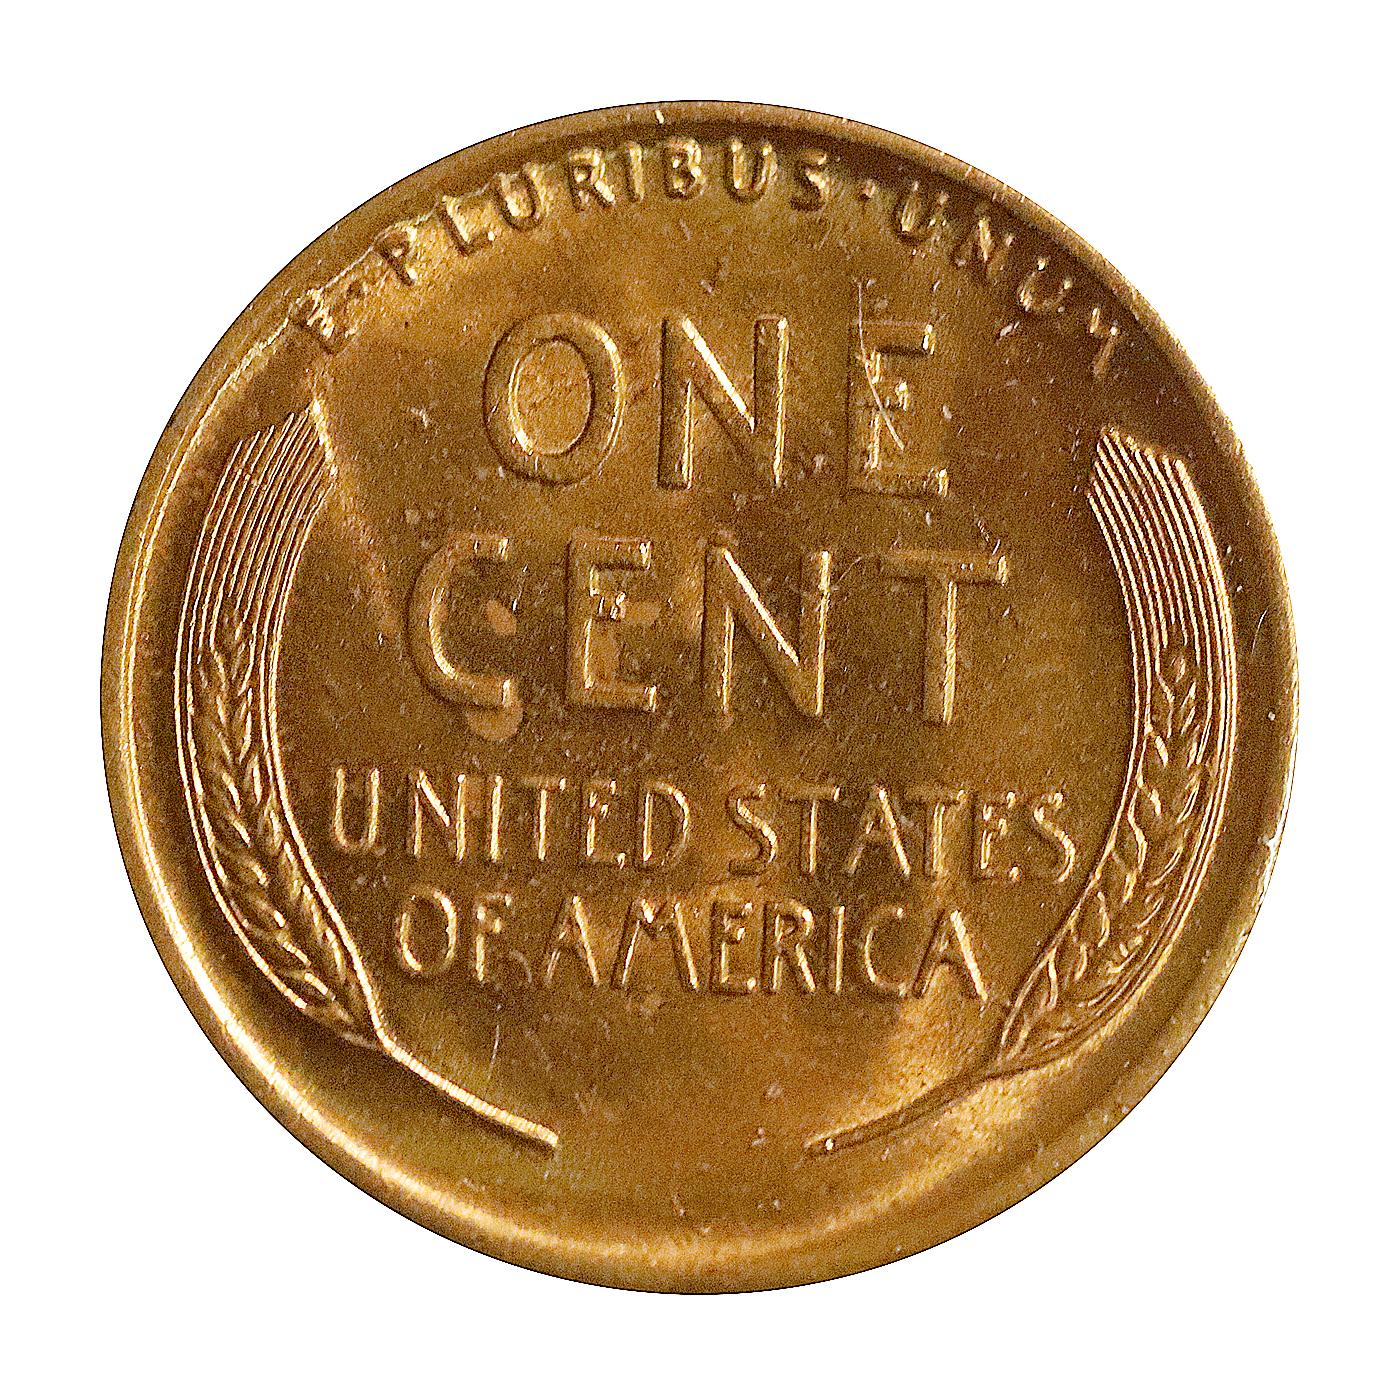 Superb - 1927 P Lincoln Wheat Cent - Gem BU / MS RD / UNC - High Grade Coin